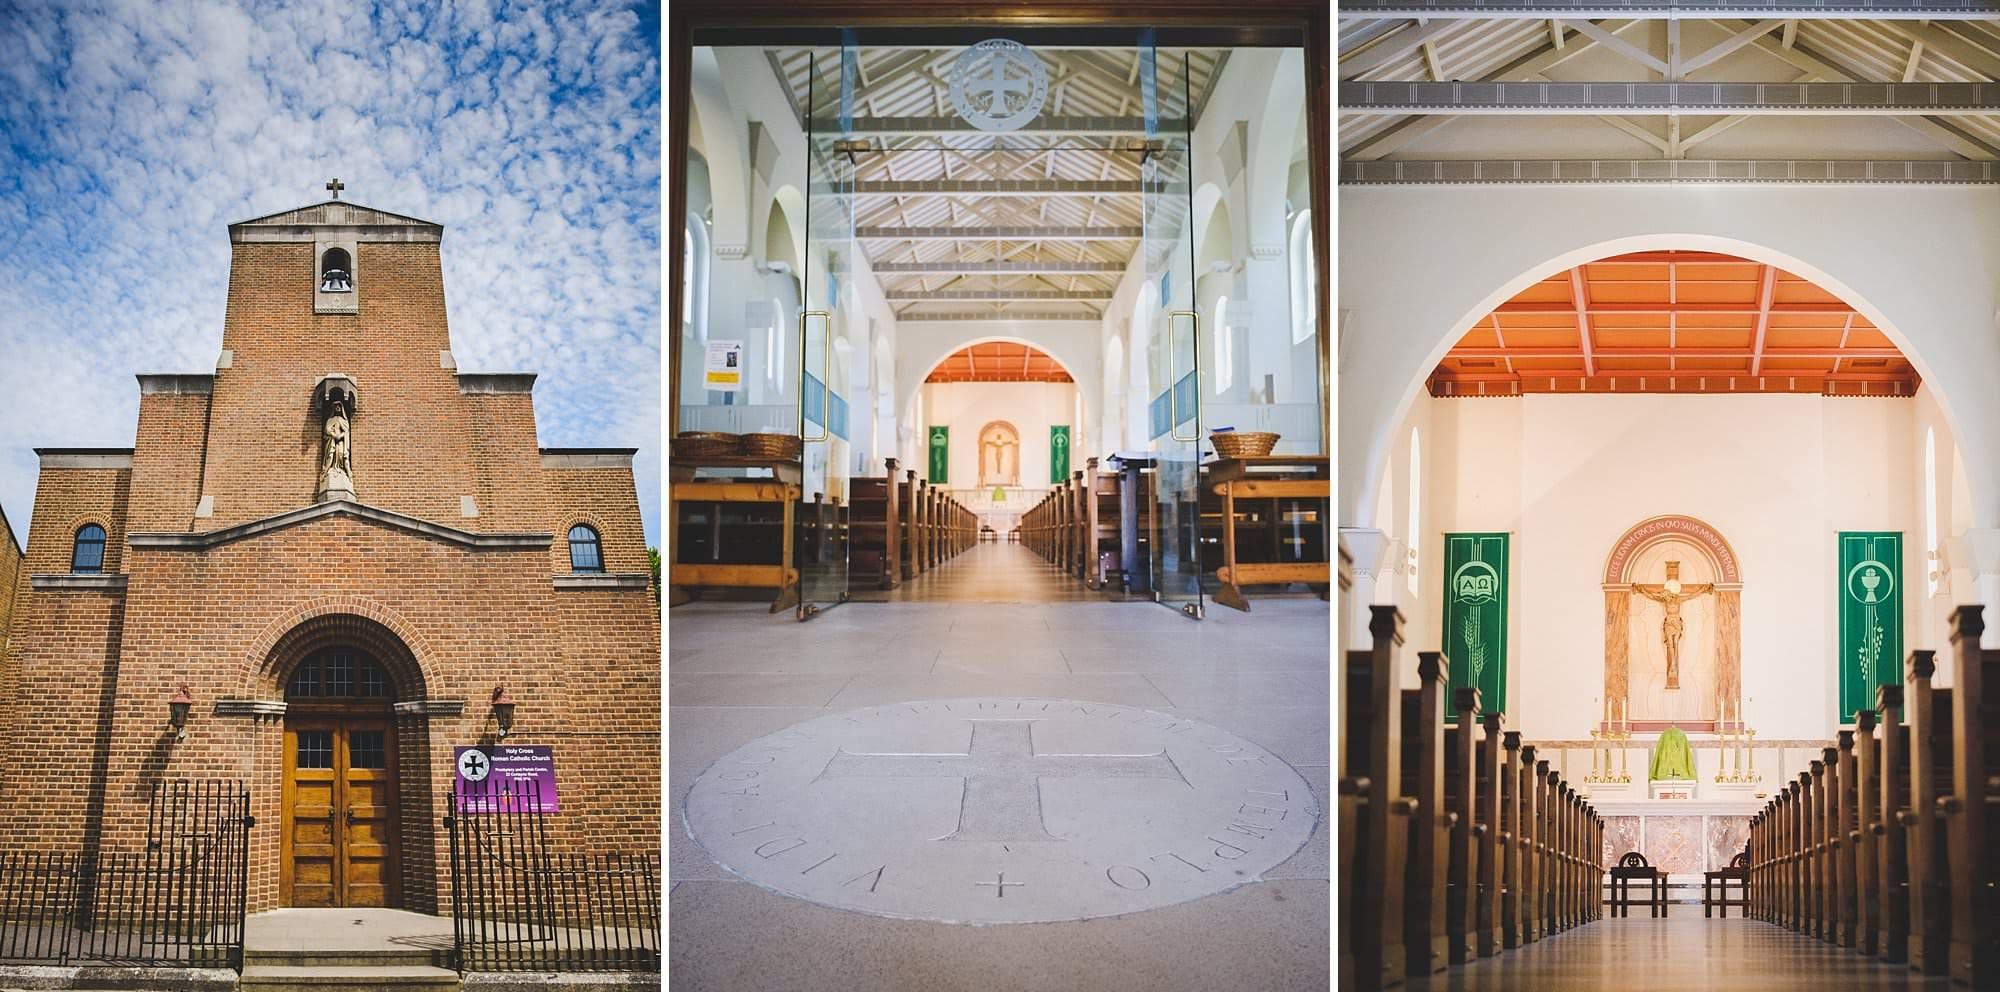 holy cross rc church parsons green wedding photographer 002 - For Couples | Holy Cross Church Wedding Photographer